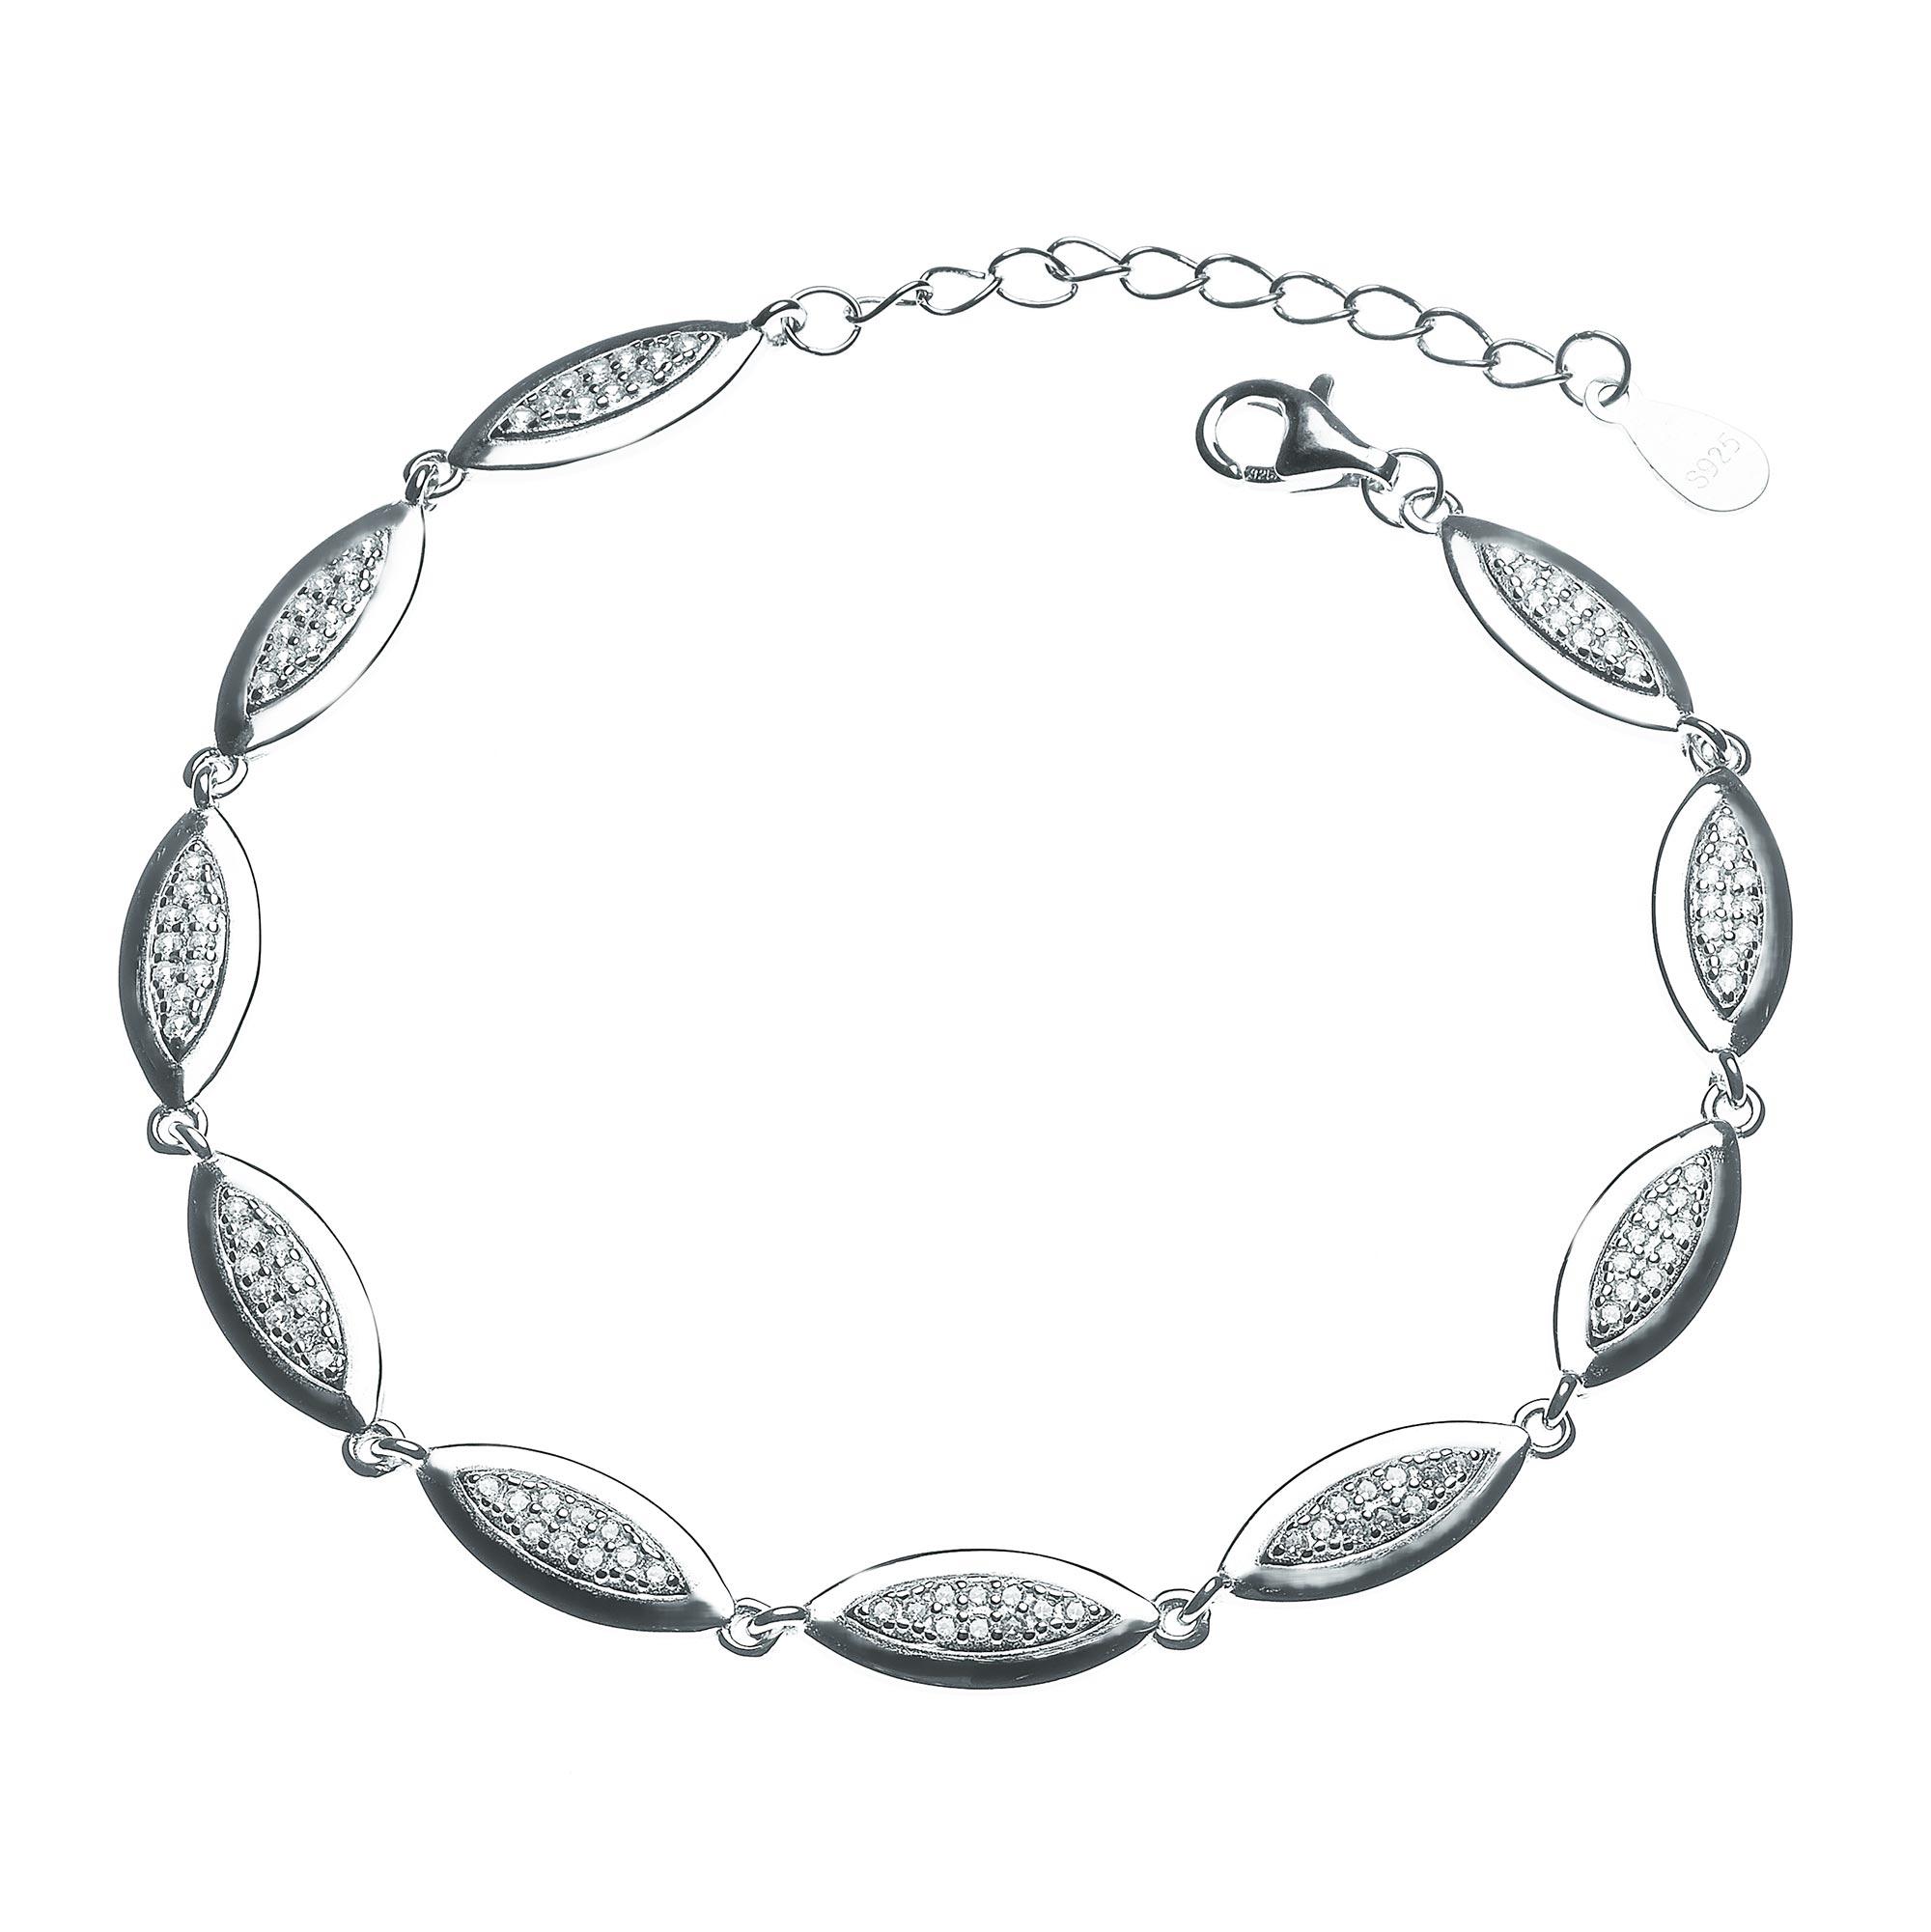 Dámský stříbrný náramek NB-1025